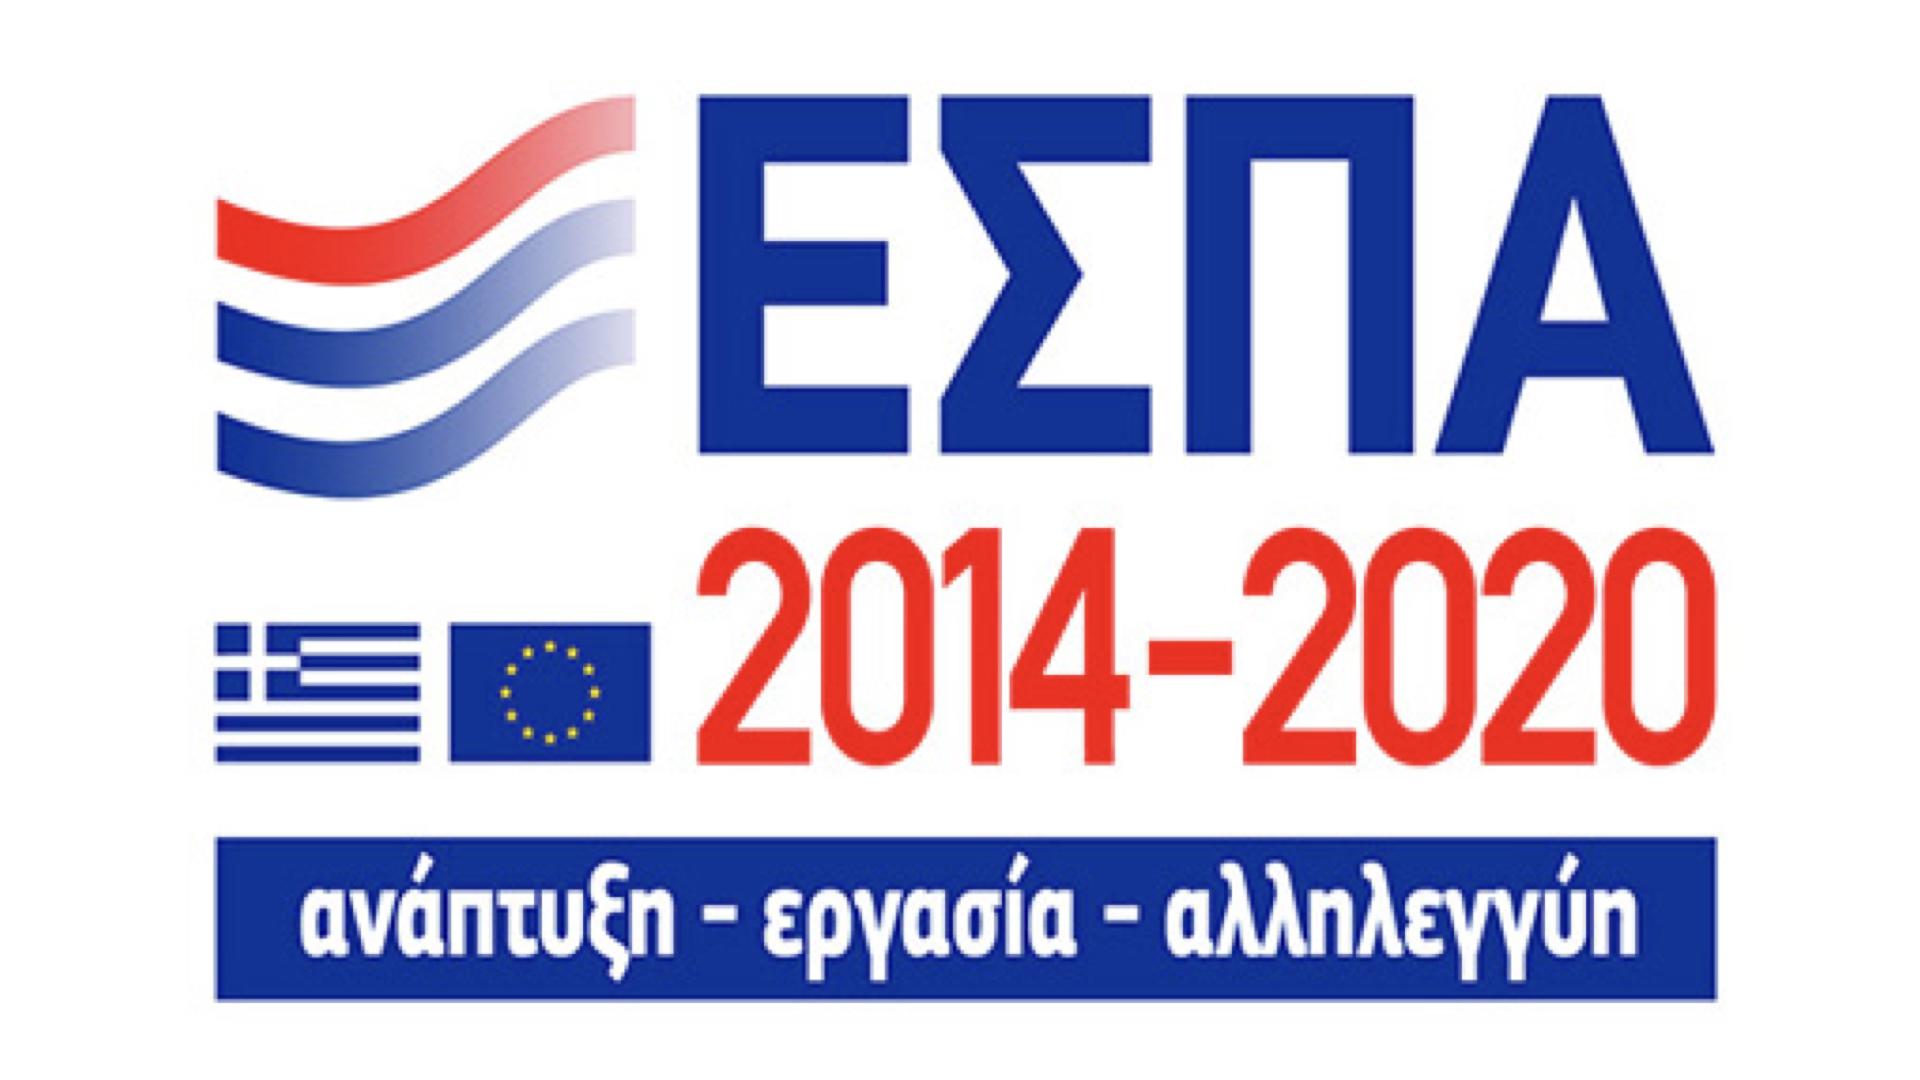 Logo Broadband Network Development in White Rural Areas of Greece